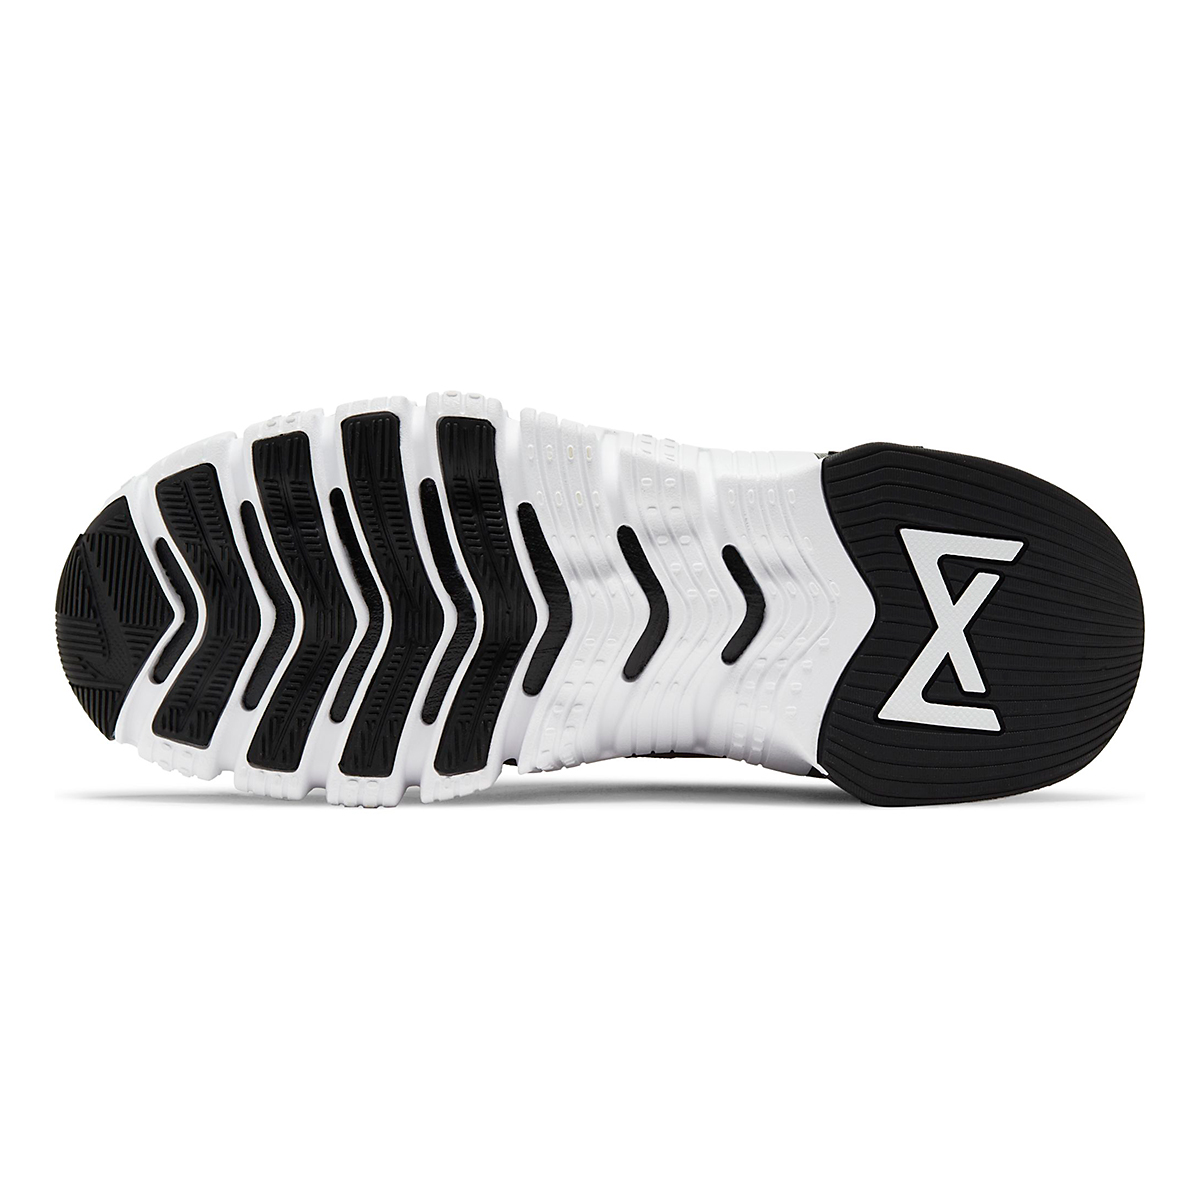 Women's Nike Free Metcon 4 Training Shoe - Color: White/Black - Size: 5 - Width: Regular, White/Black, large, image 3